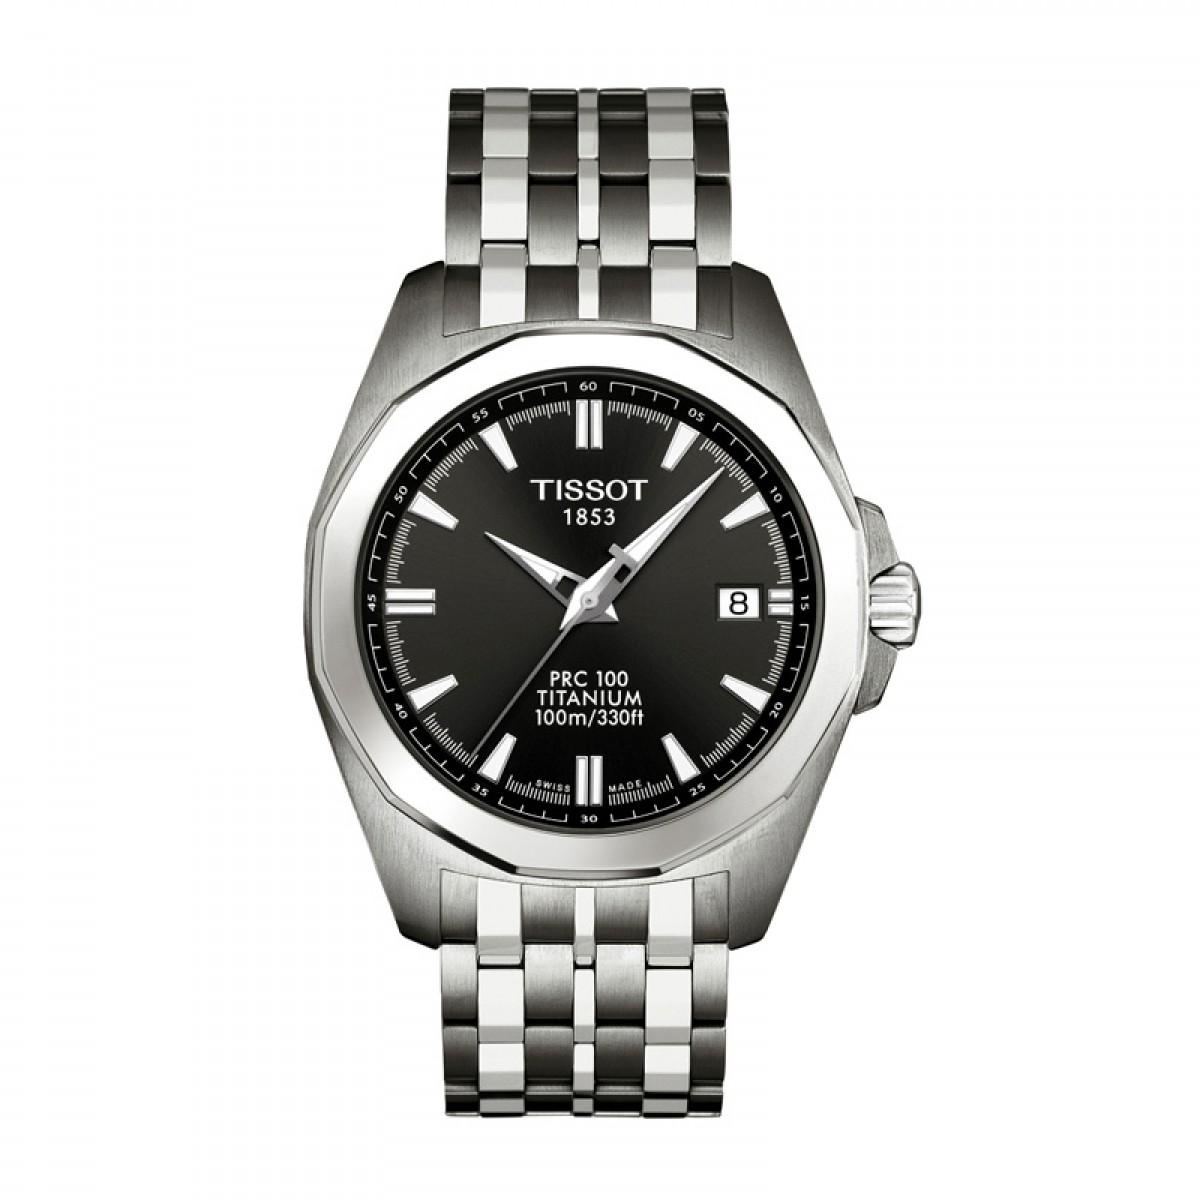 Часовник Tissot T008.410.44.061.00